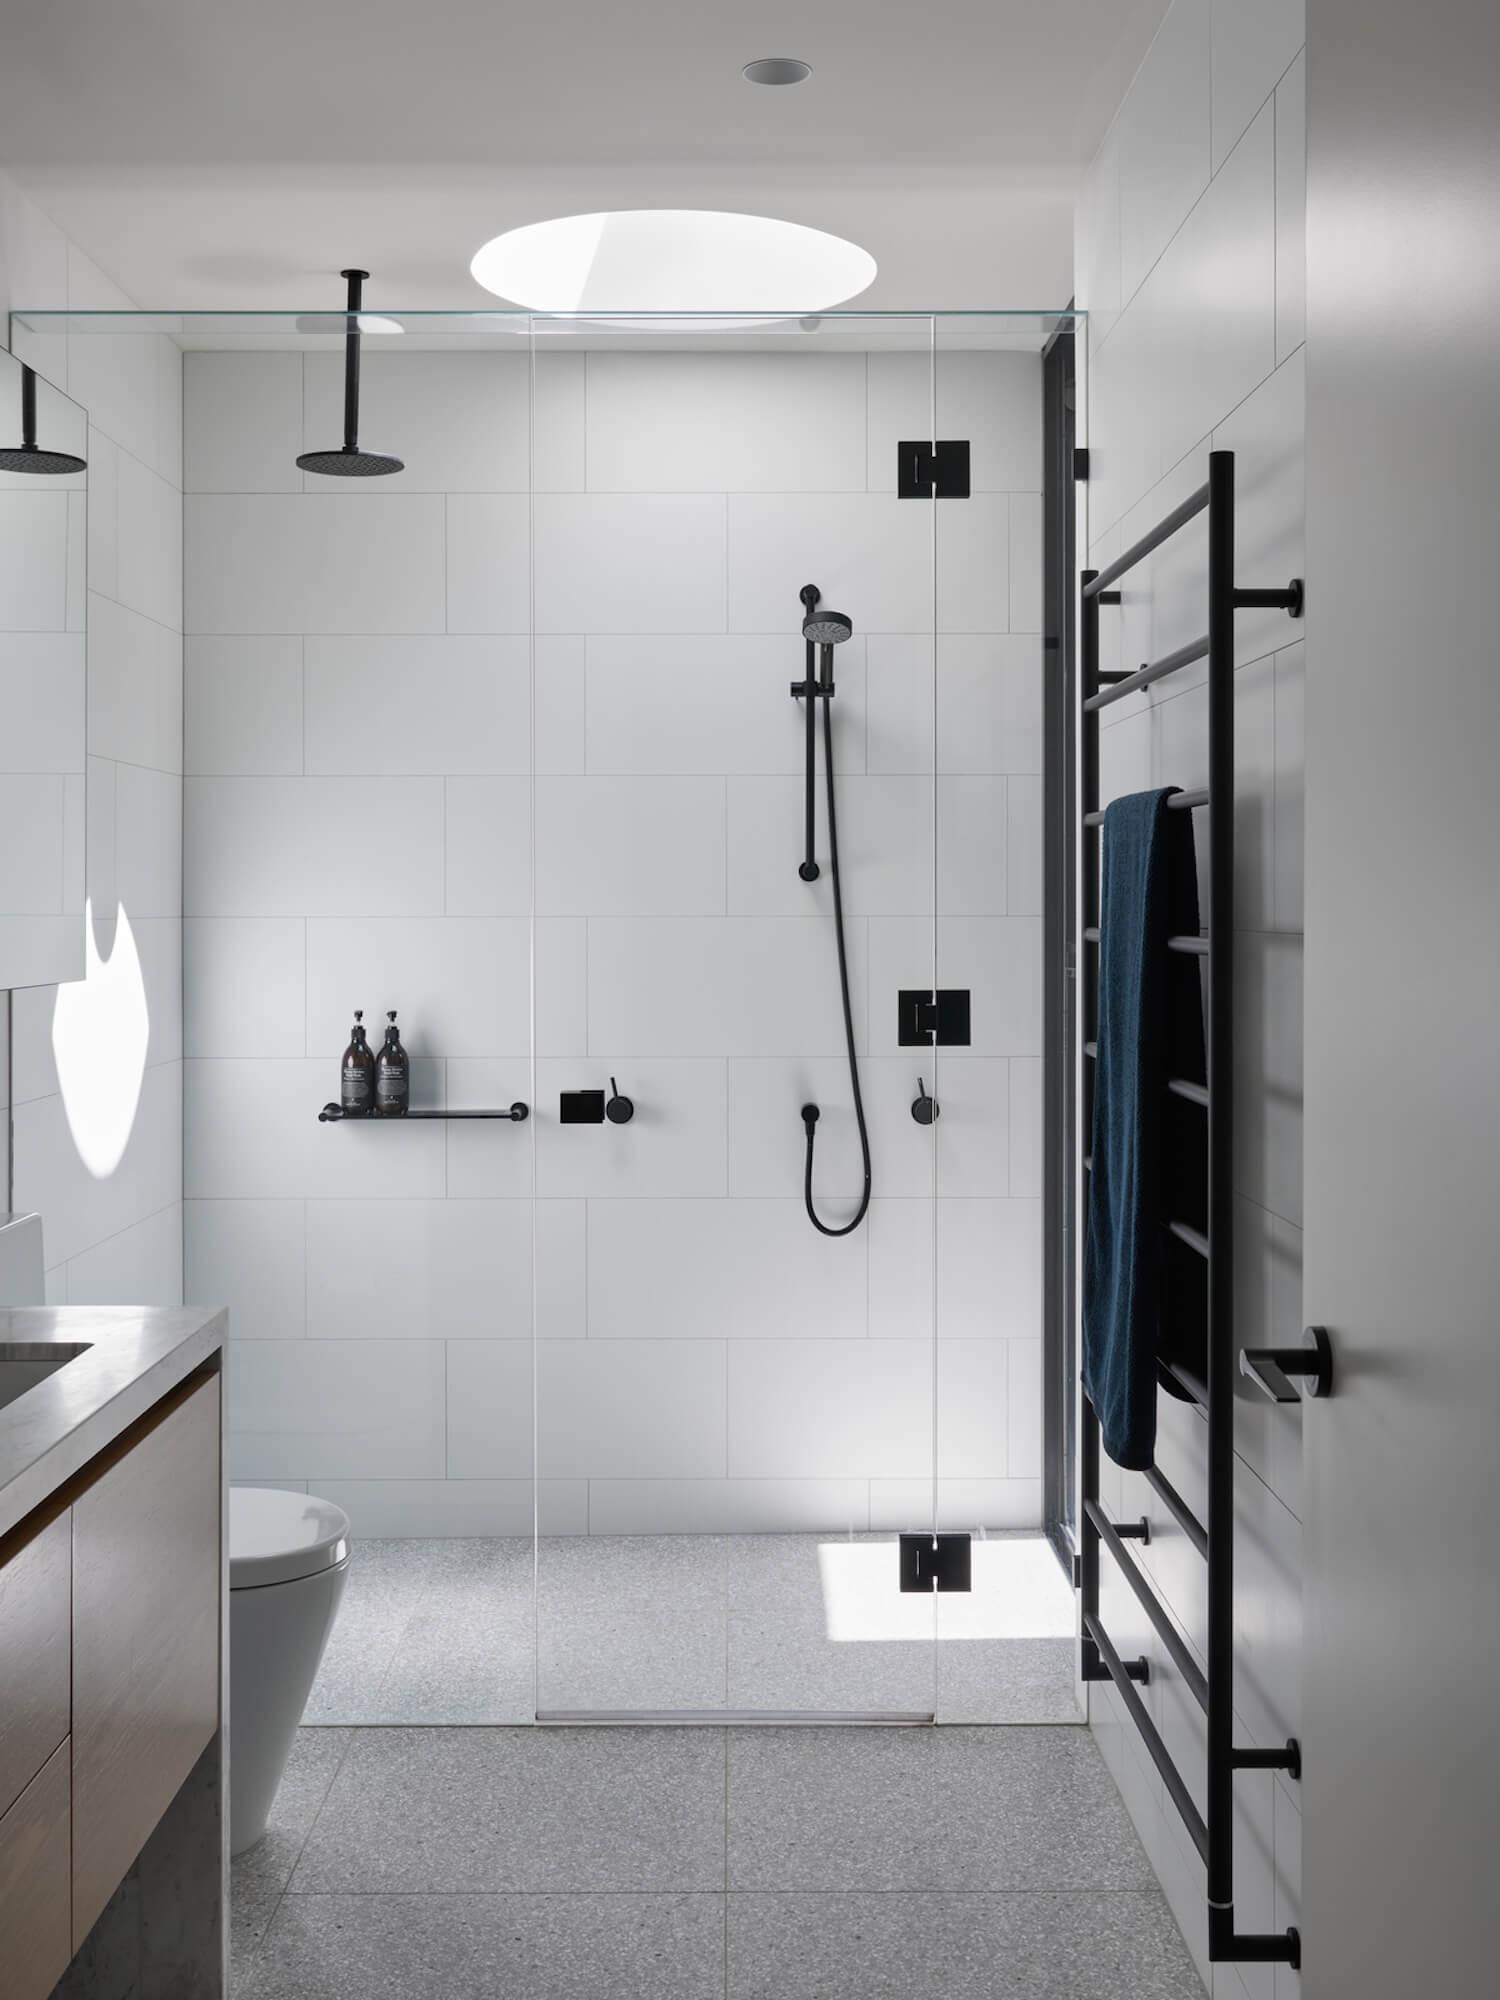 est living malvern east house pleysier perkins bathroom 7